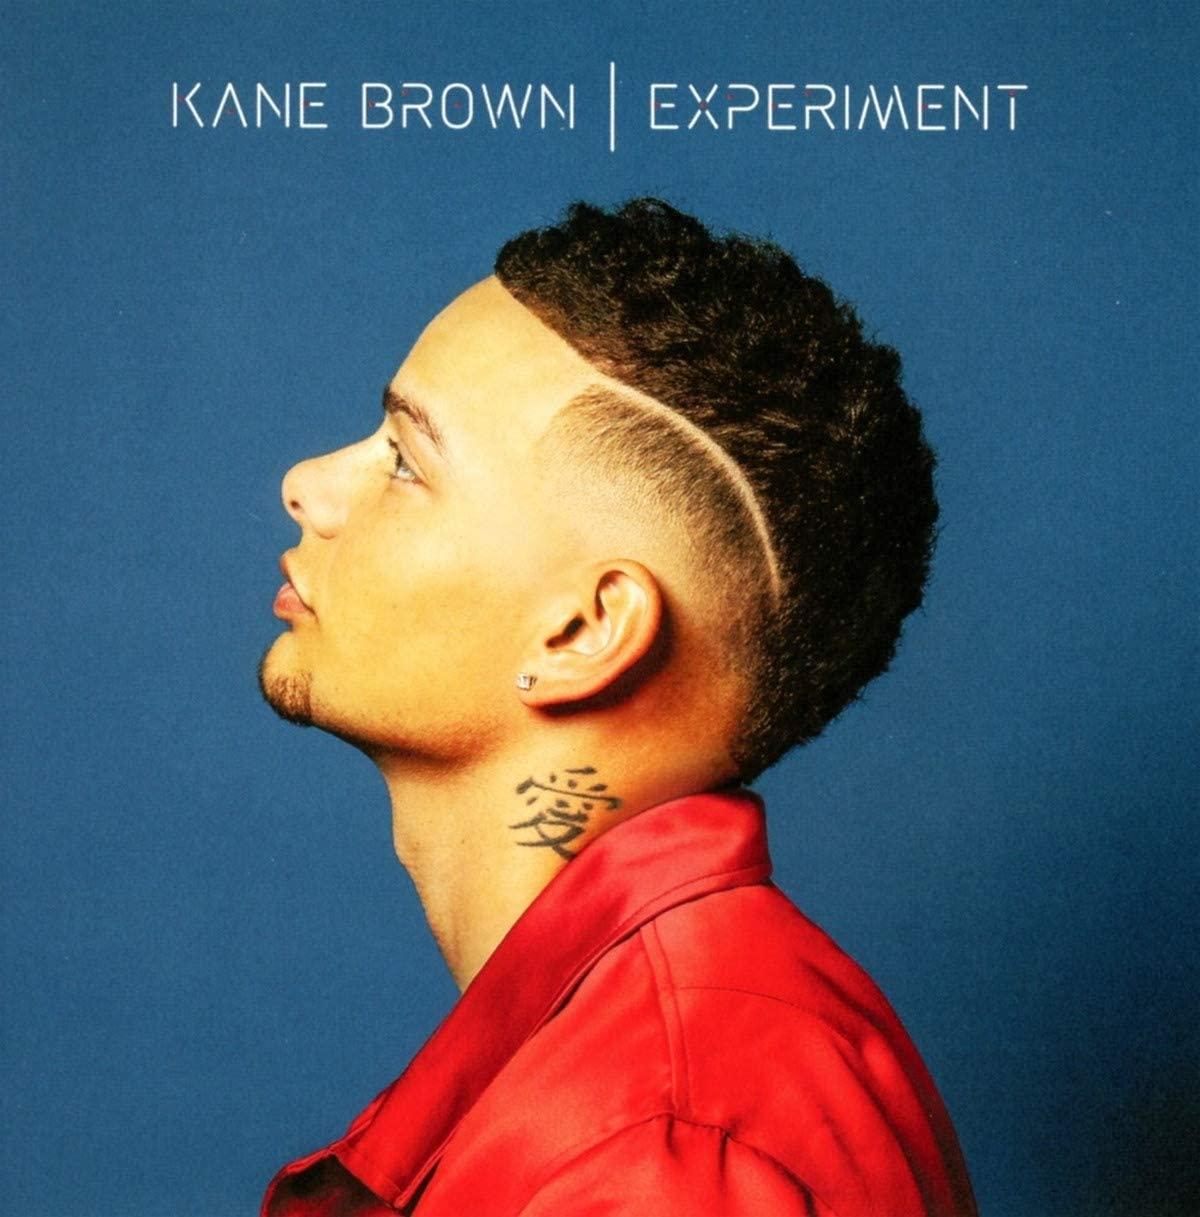 Kane Brown - Experiment Album Cover